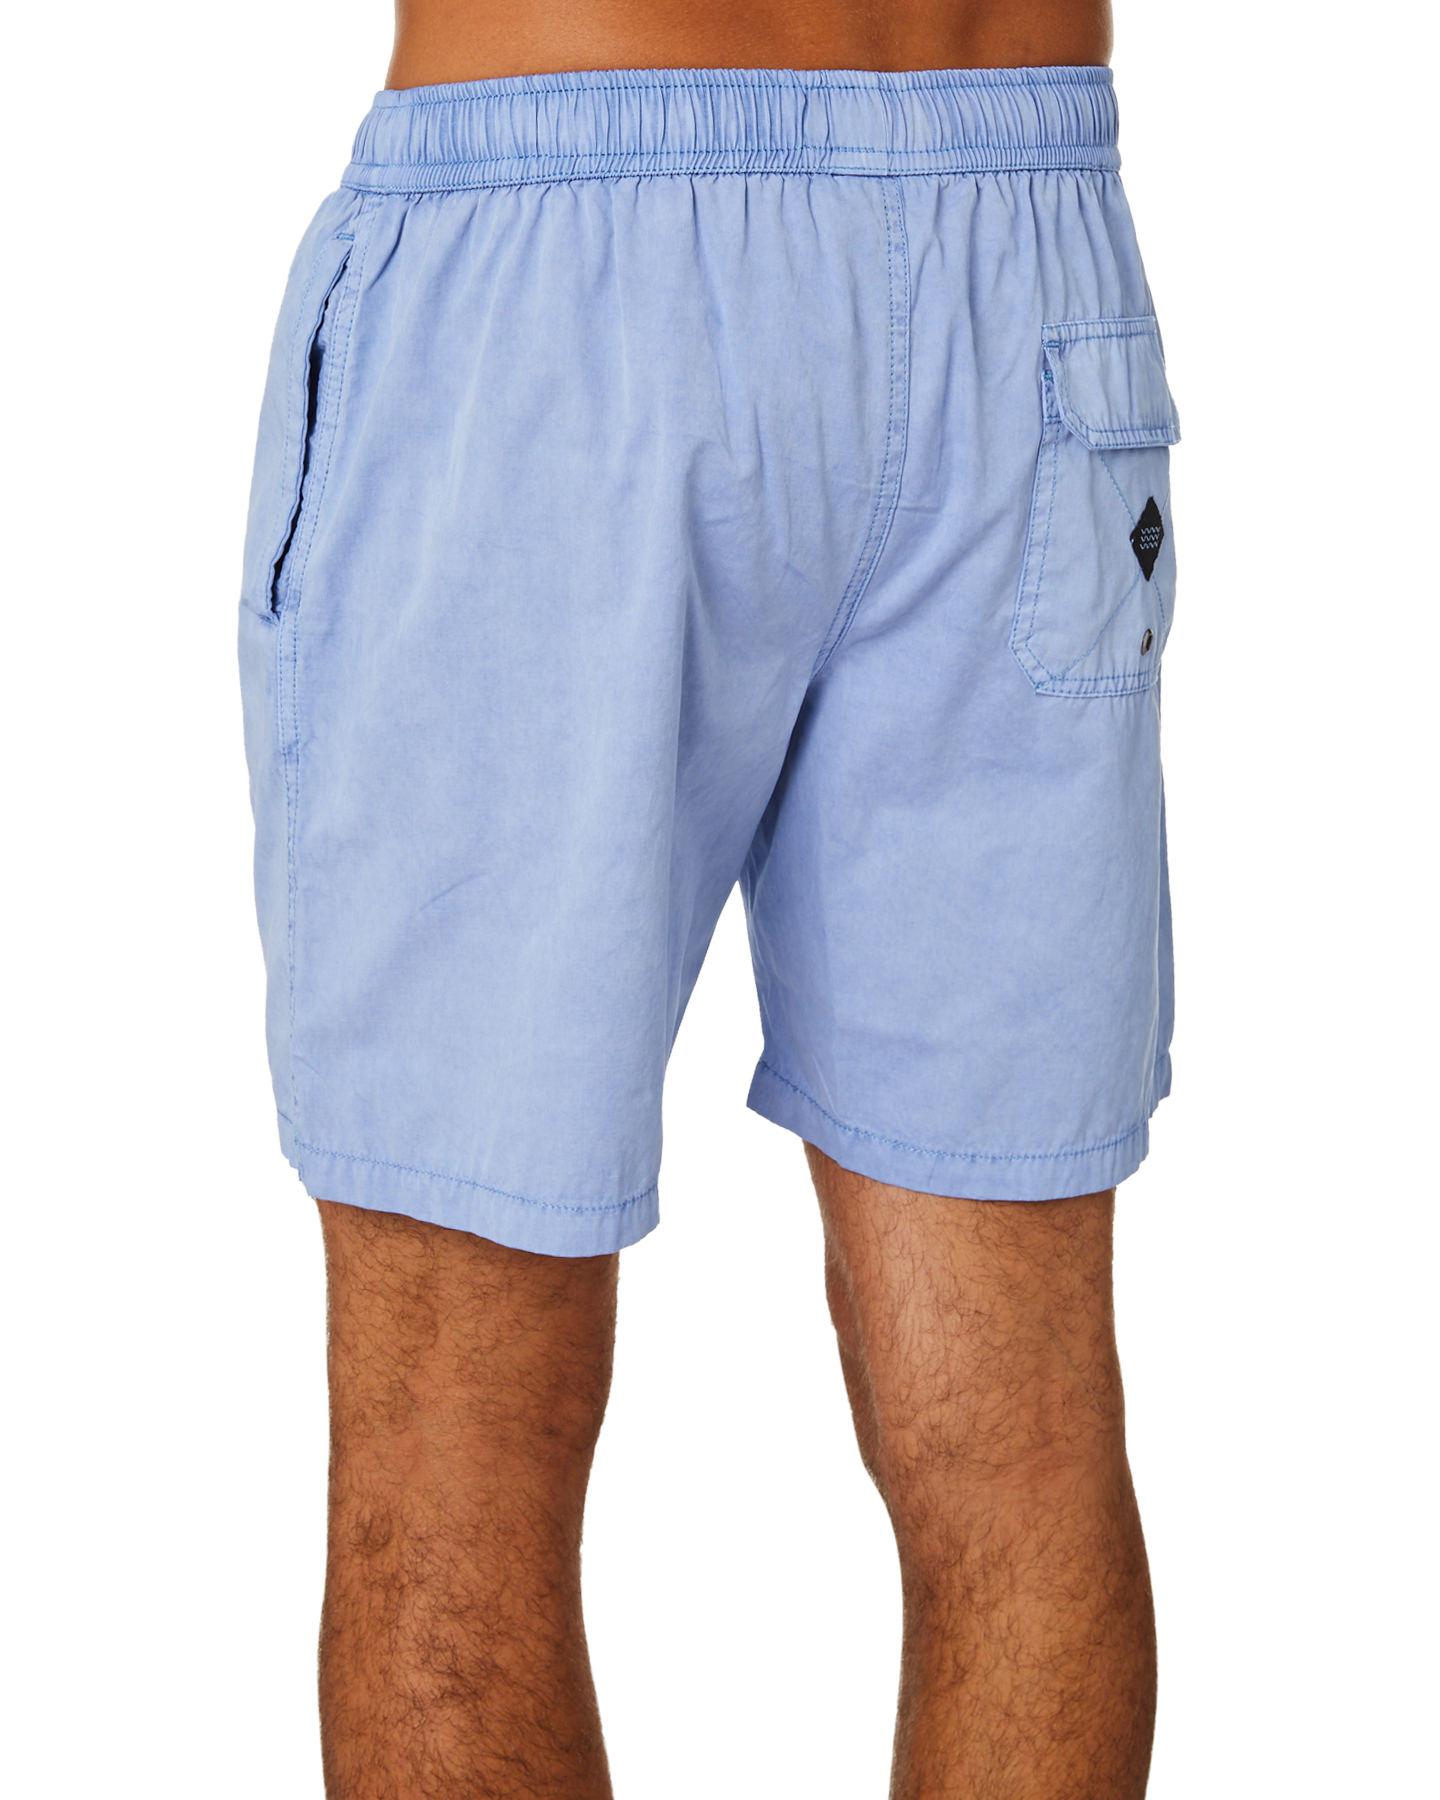 New-Swell-Men-039-s-Malibu-Mens-Beach-Short-Cotton-Polyester-Grey thumbnail 21